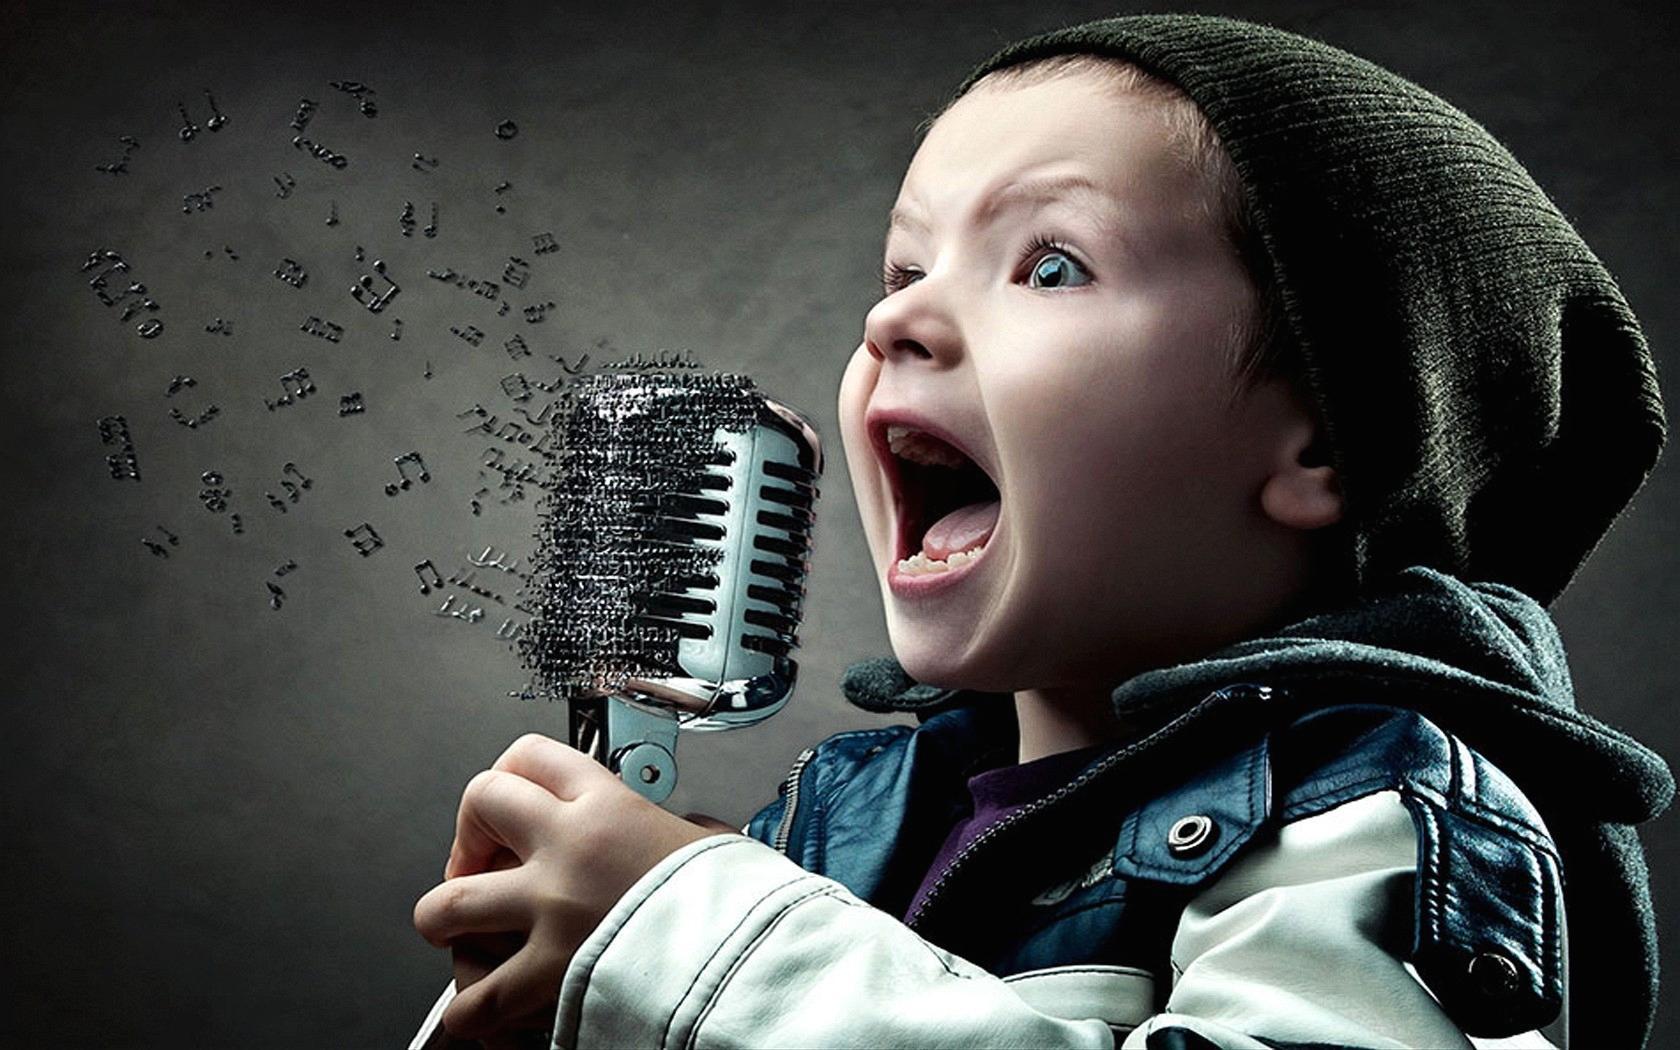 Images of Singer | 1680x1050